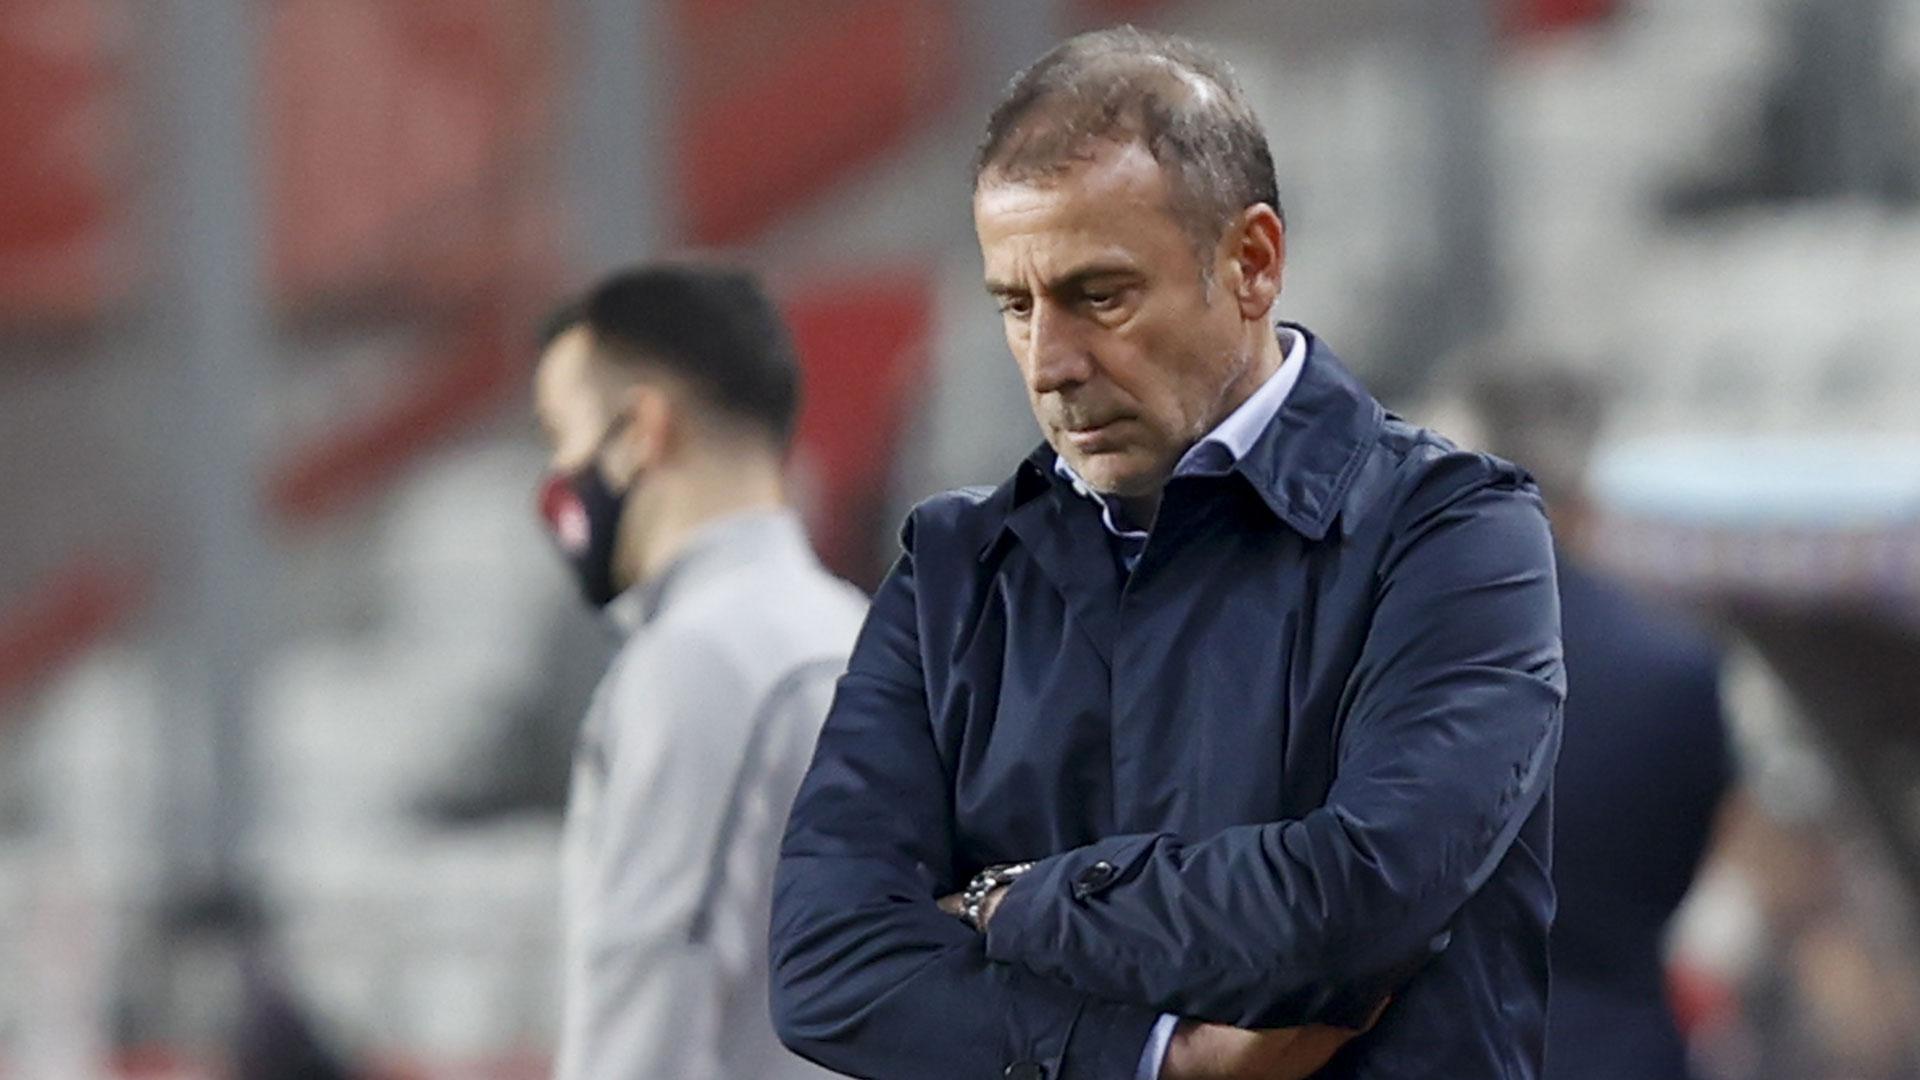 Abdullah Avcı Trabzonspor 16 Ocak 2021